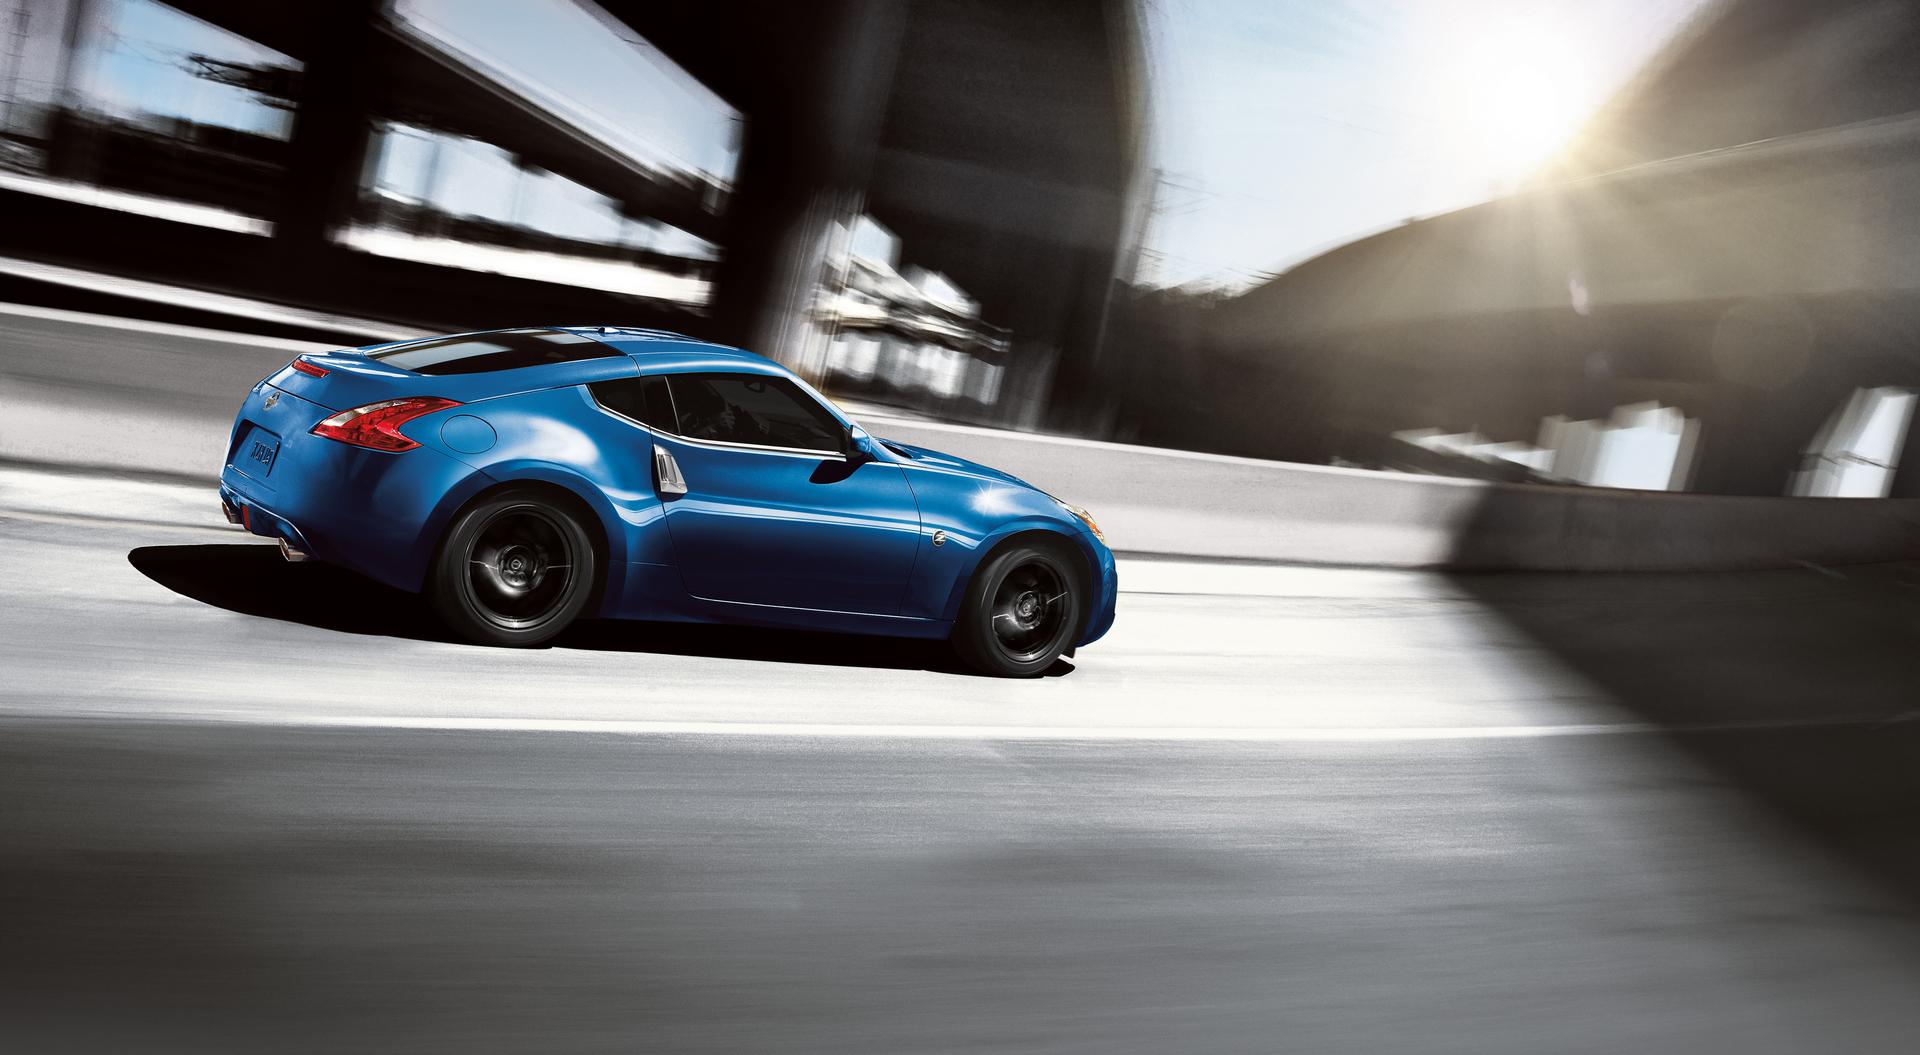 2015 Nissan 370Z Coupe © Nissan Motor Co., Ltd.